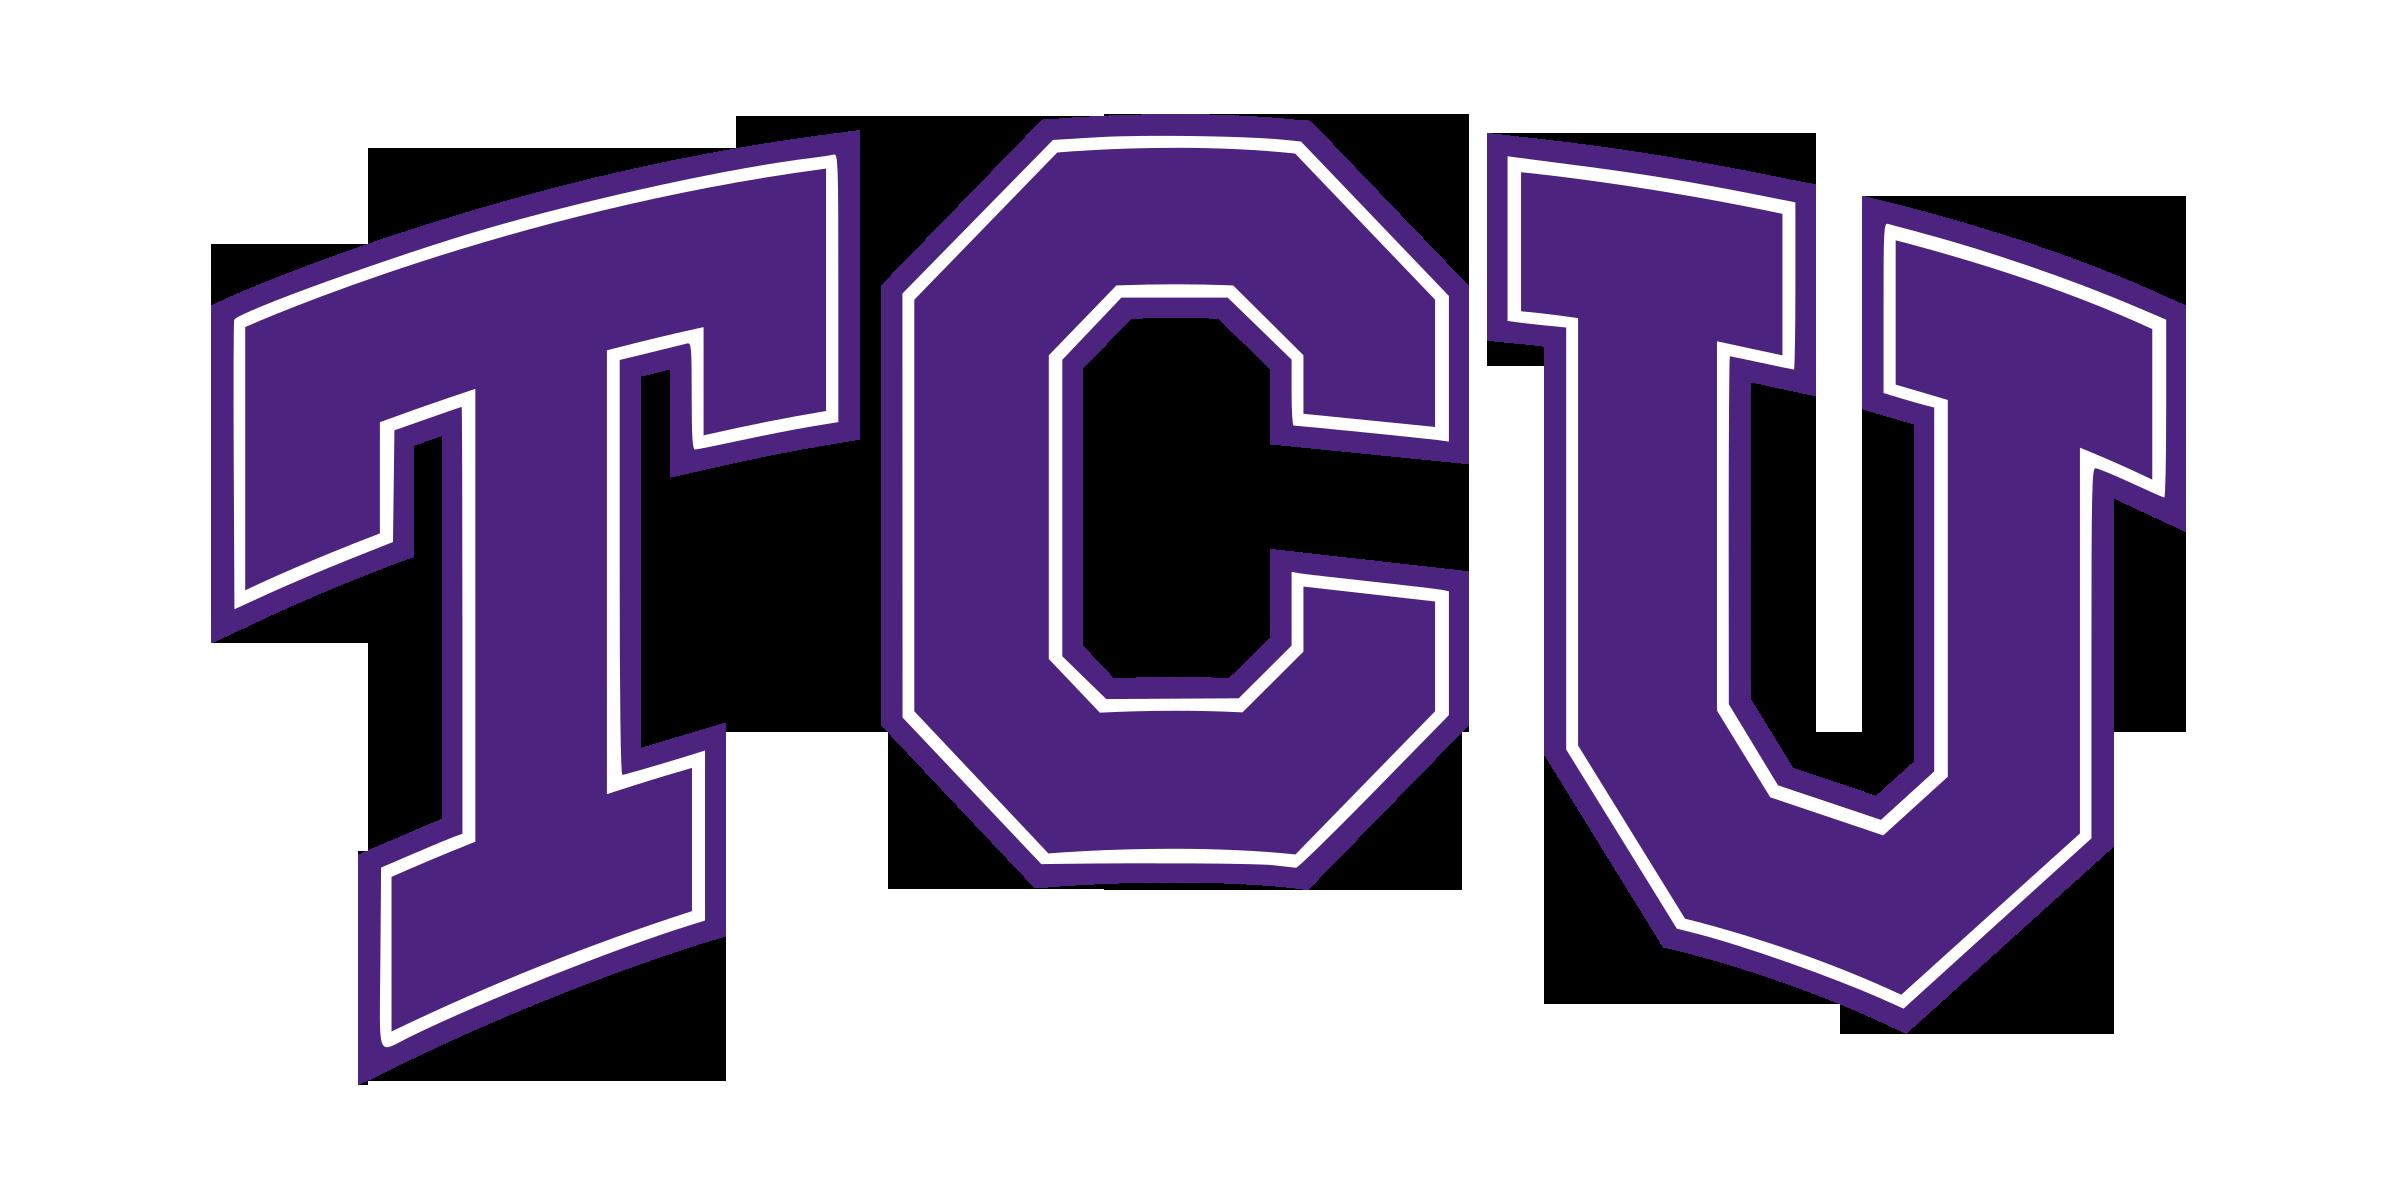 Tcu Logo Tcu Symbol Meaning History And Evolution